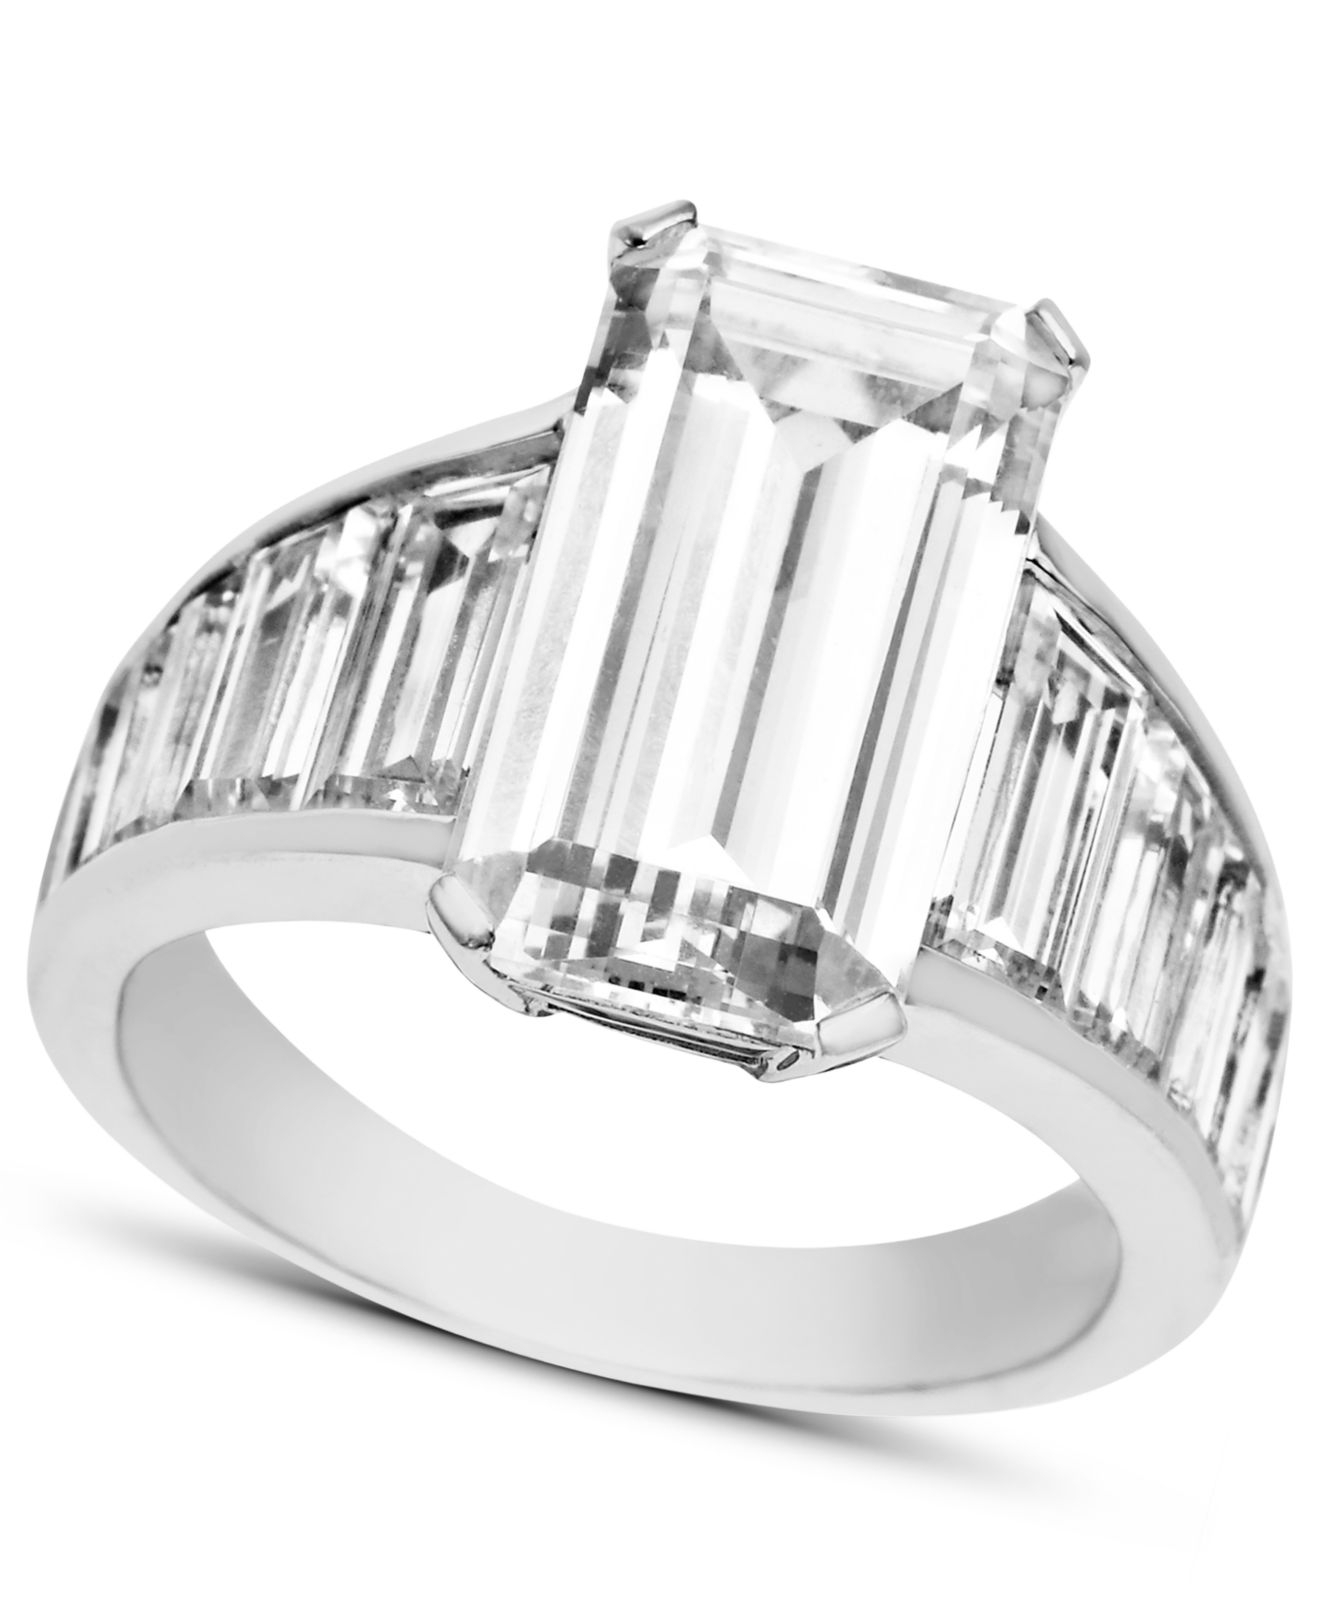 Lyst - Arabella Swarovski Zirconia Emerald-cut Ring (14-1 4 Ct. T.w. ... 432855b74c